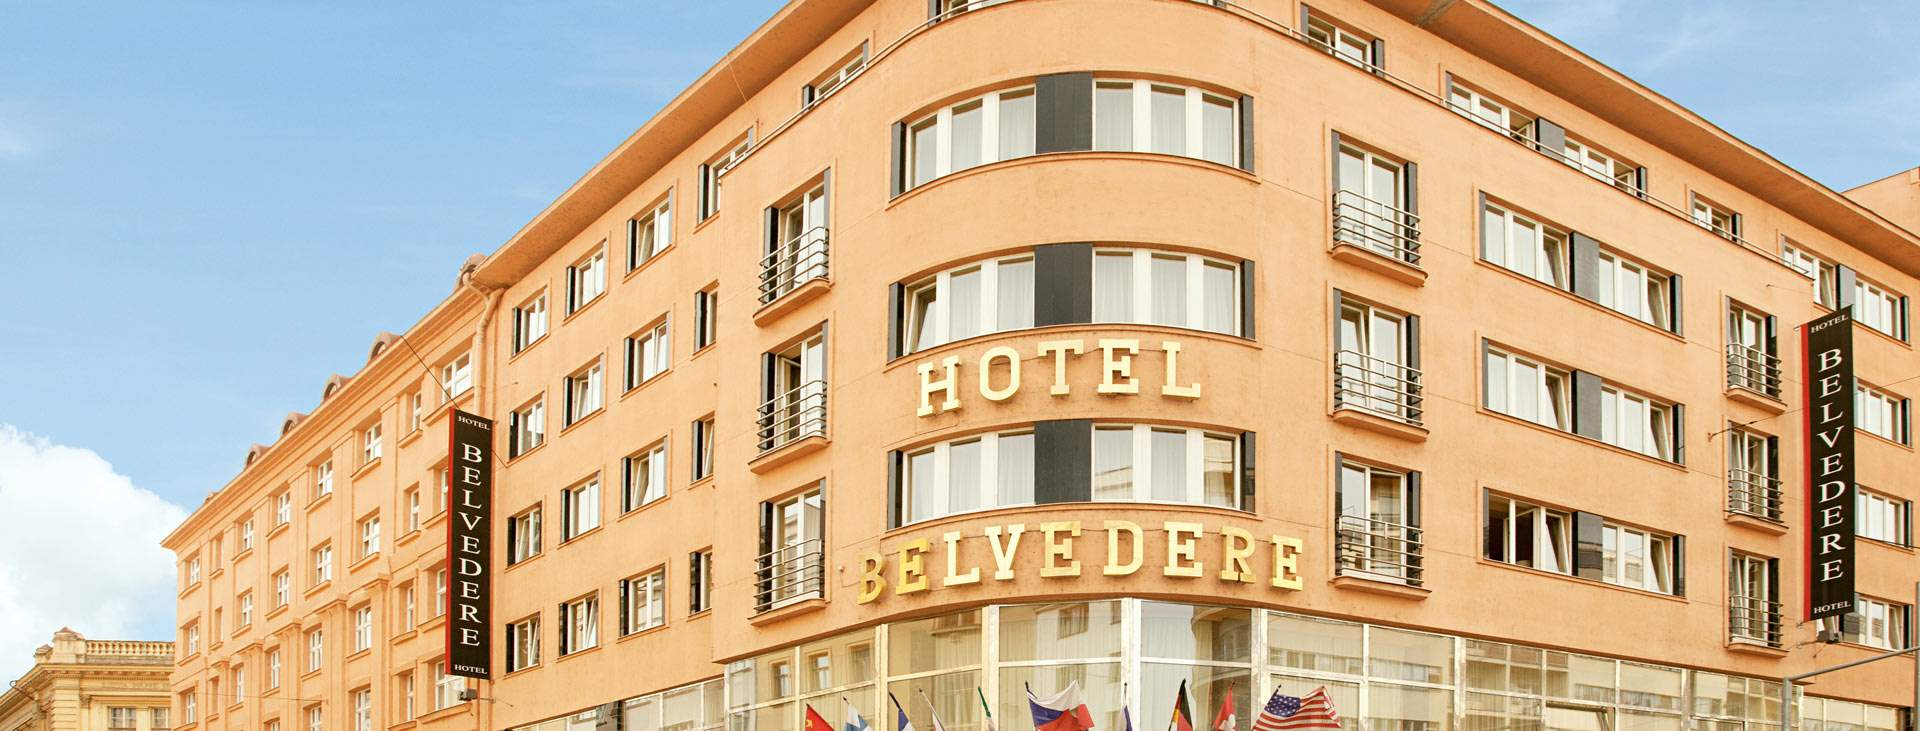 Hotelli Belvedere Praha Tjareborg